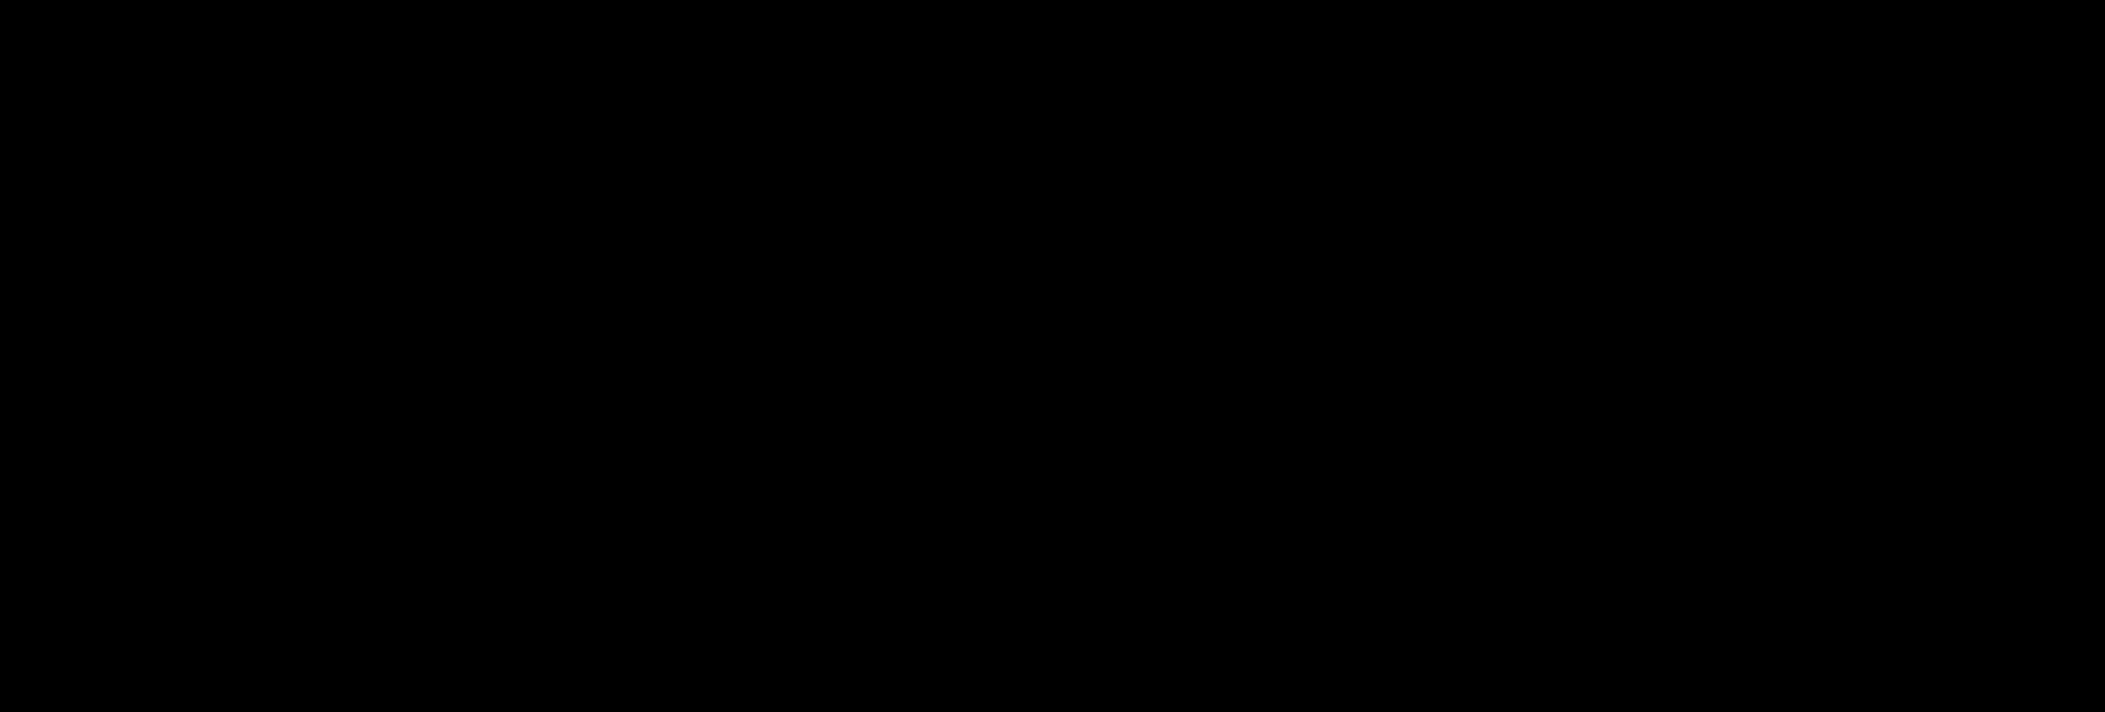 JCC-JCM-logo-03